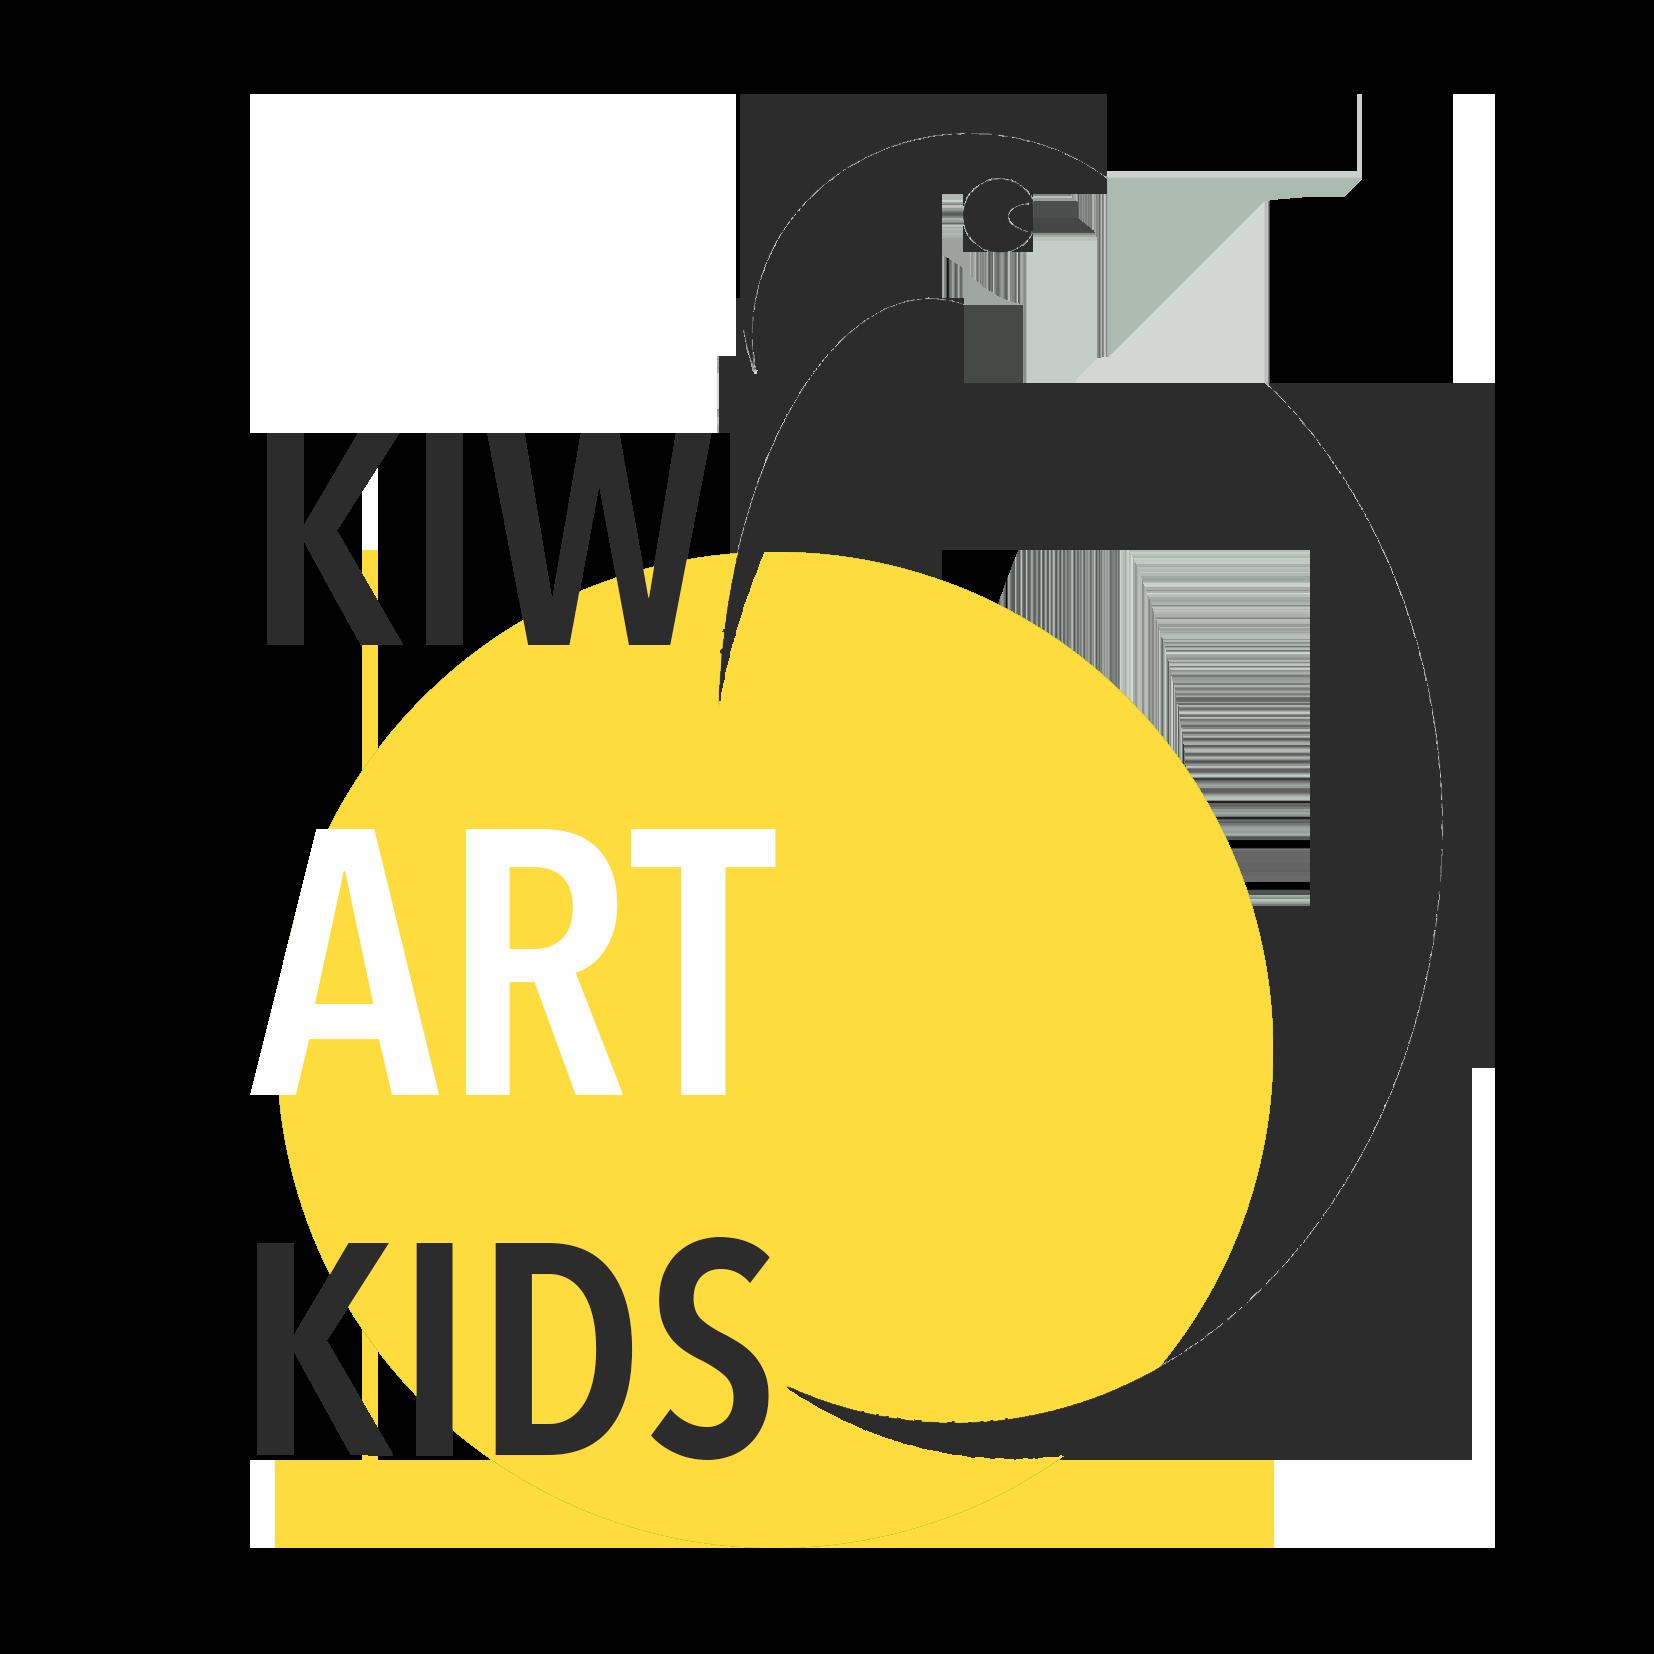 © 2019 KIWI ART KIDS